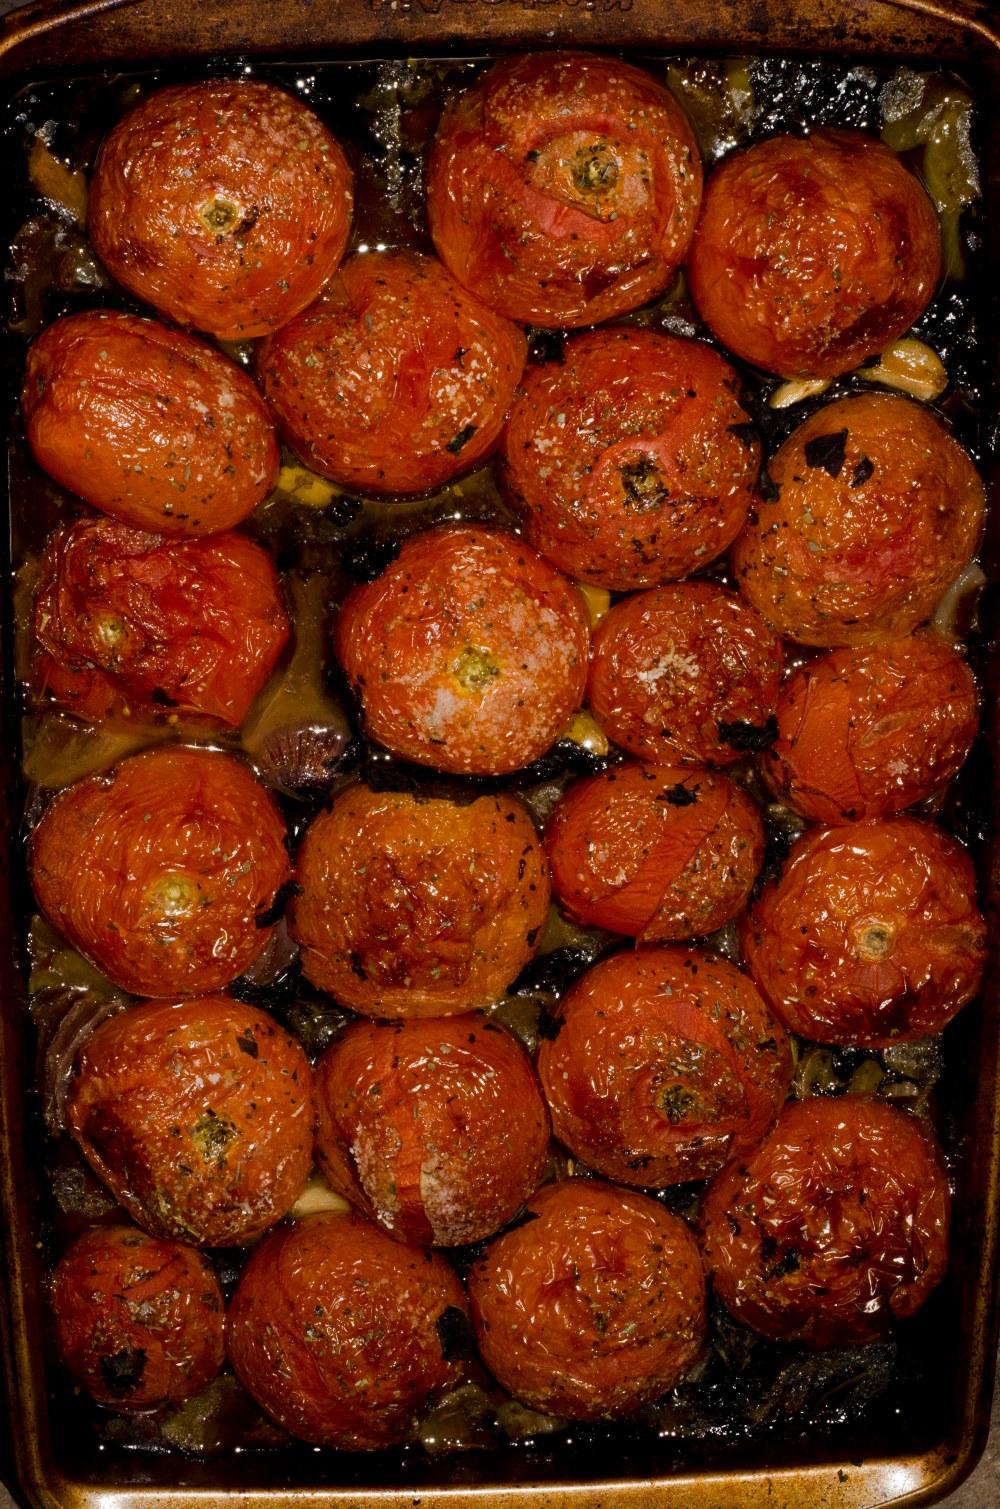 Roasted_tomatoes_2.jpg